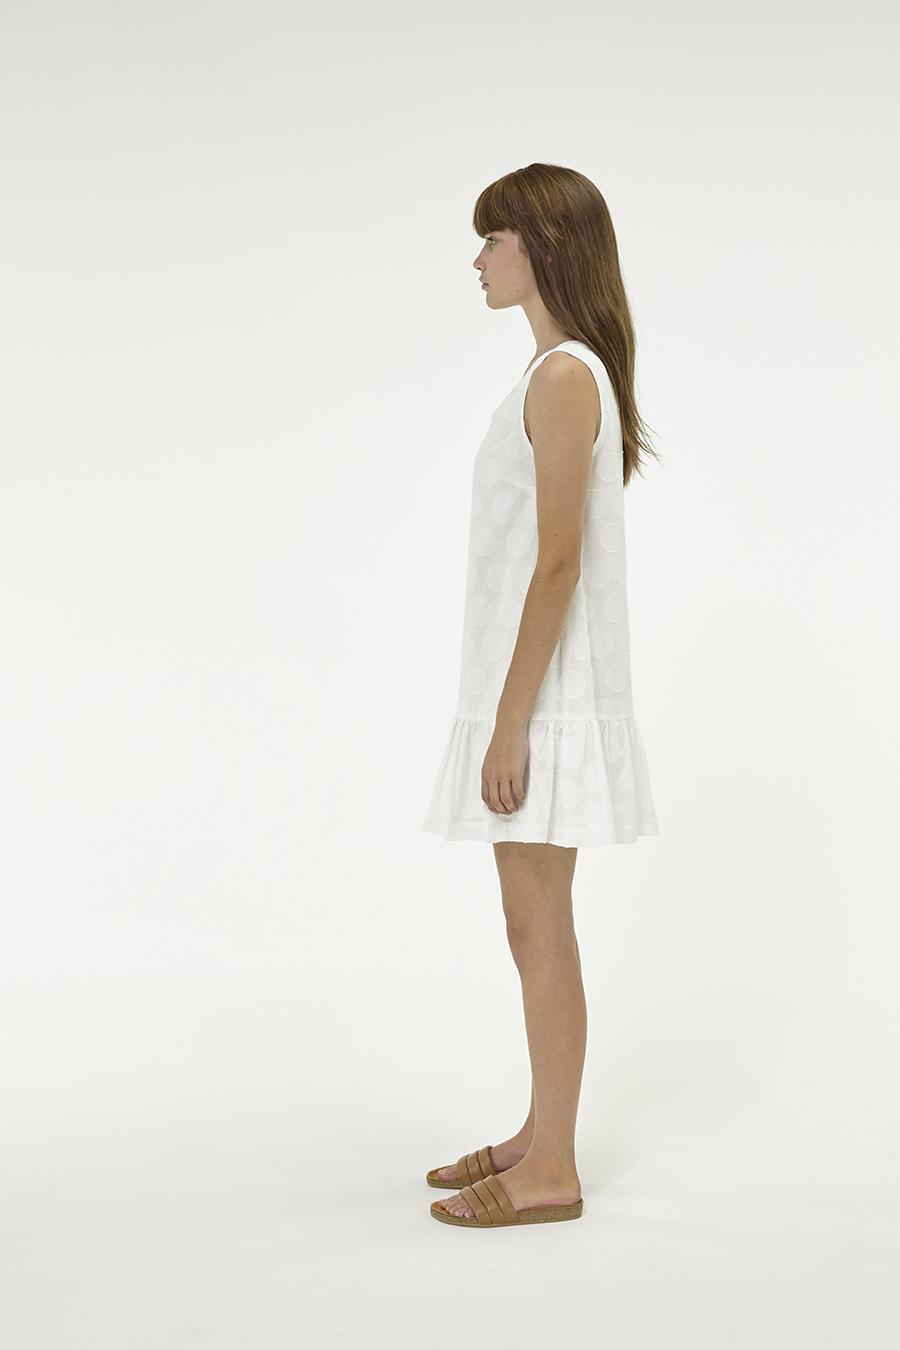 Huffer_Q3-16_W-Spot-Port-Dress_White-02